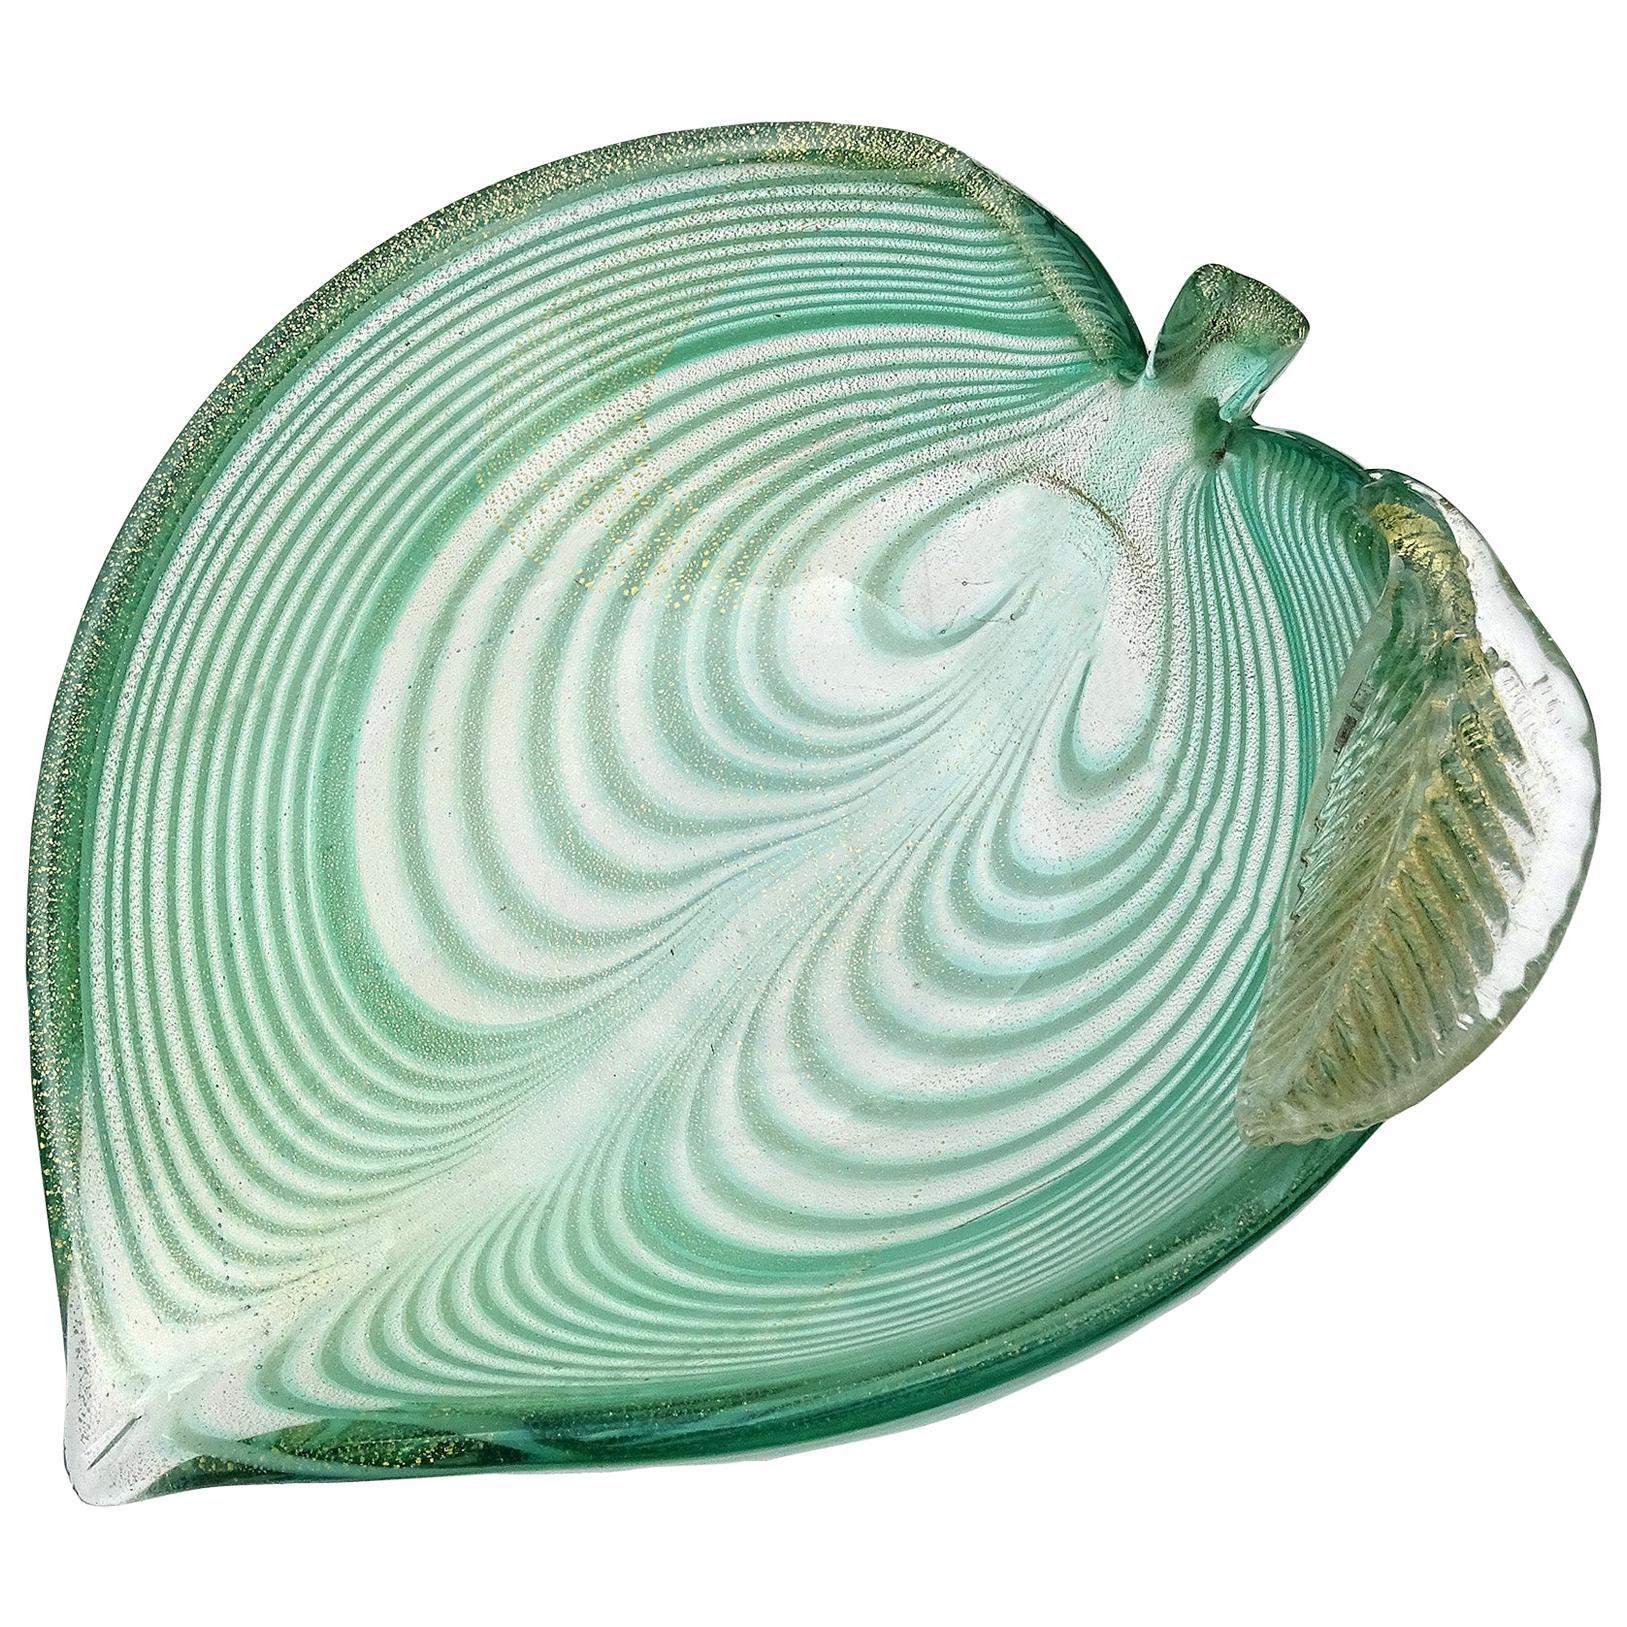 Murano Green Fenicio Pulled Feather Gold Flecks Italian Art Glass Leaf Bowl